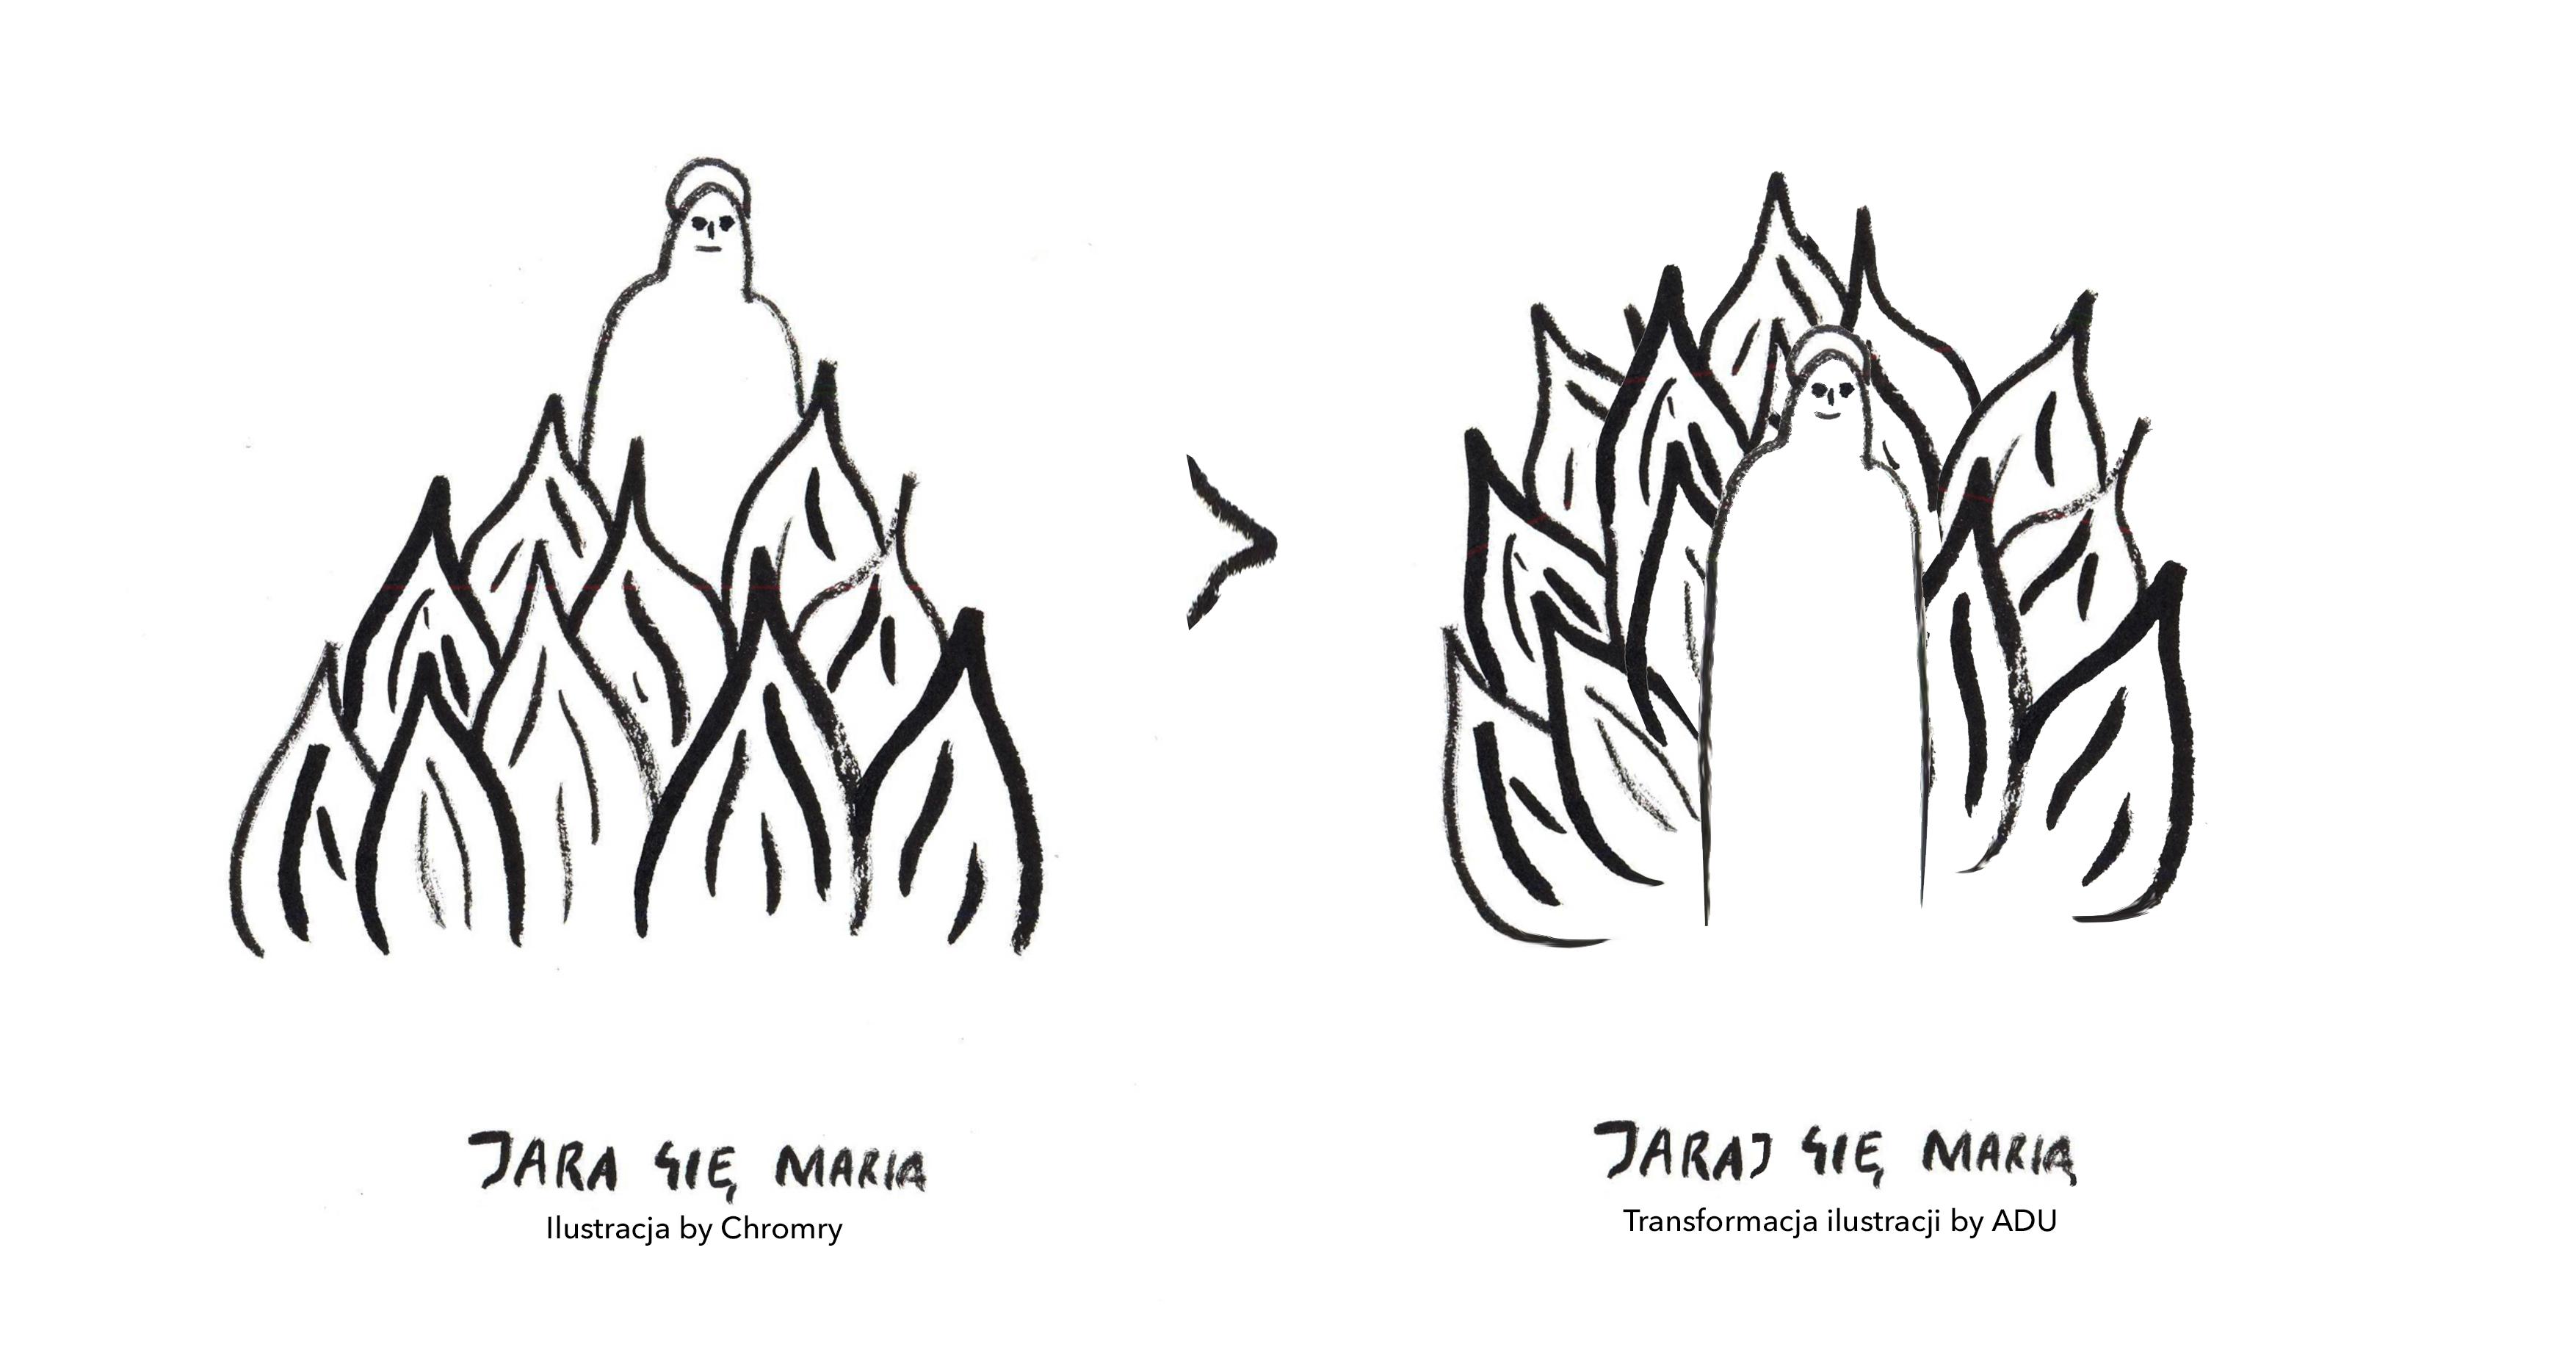 maria_i_transformacja_plomieni